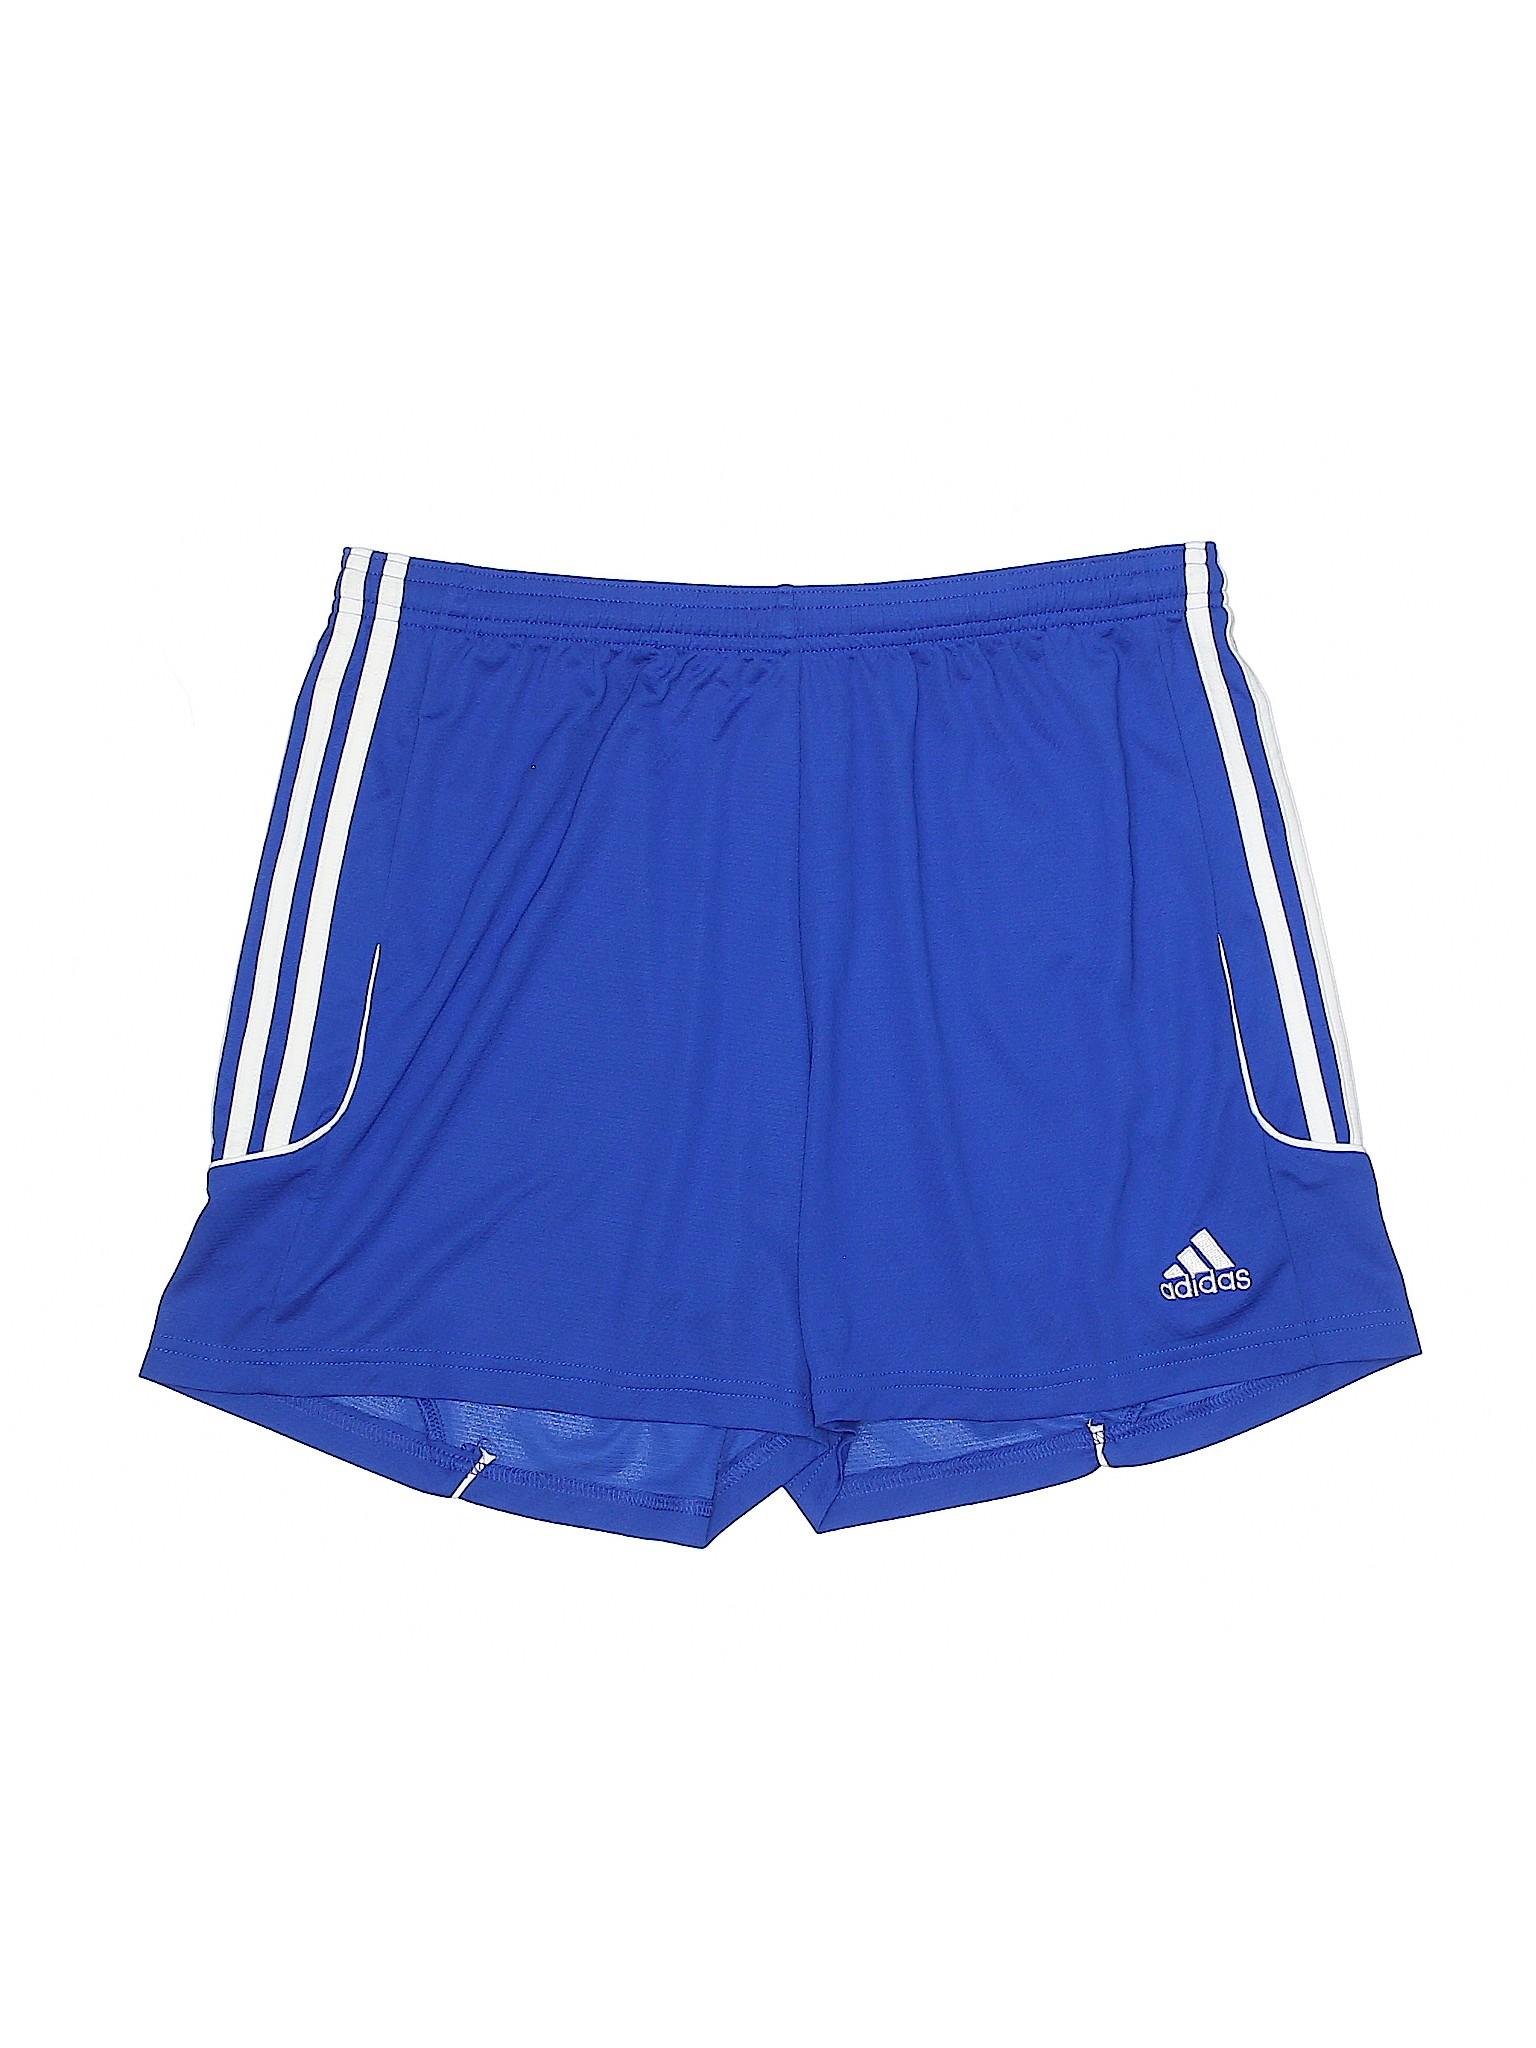 Boutique Adidas Adidas Boutique Shorts Athletic Boutique Athletic Adidas Shorts PWTqnzdPw